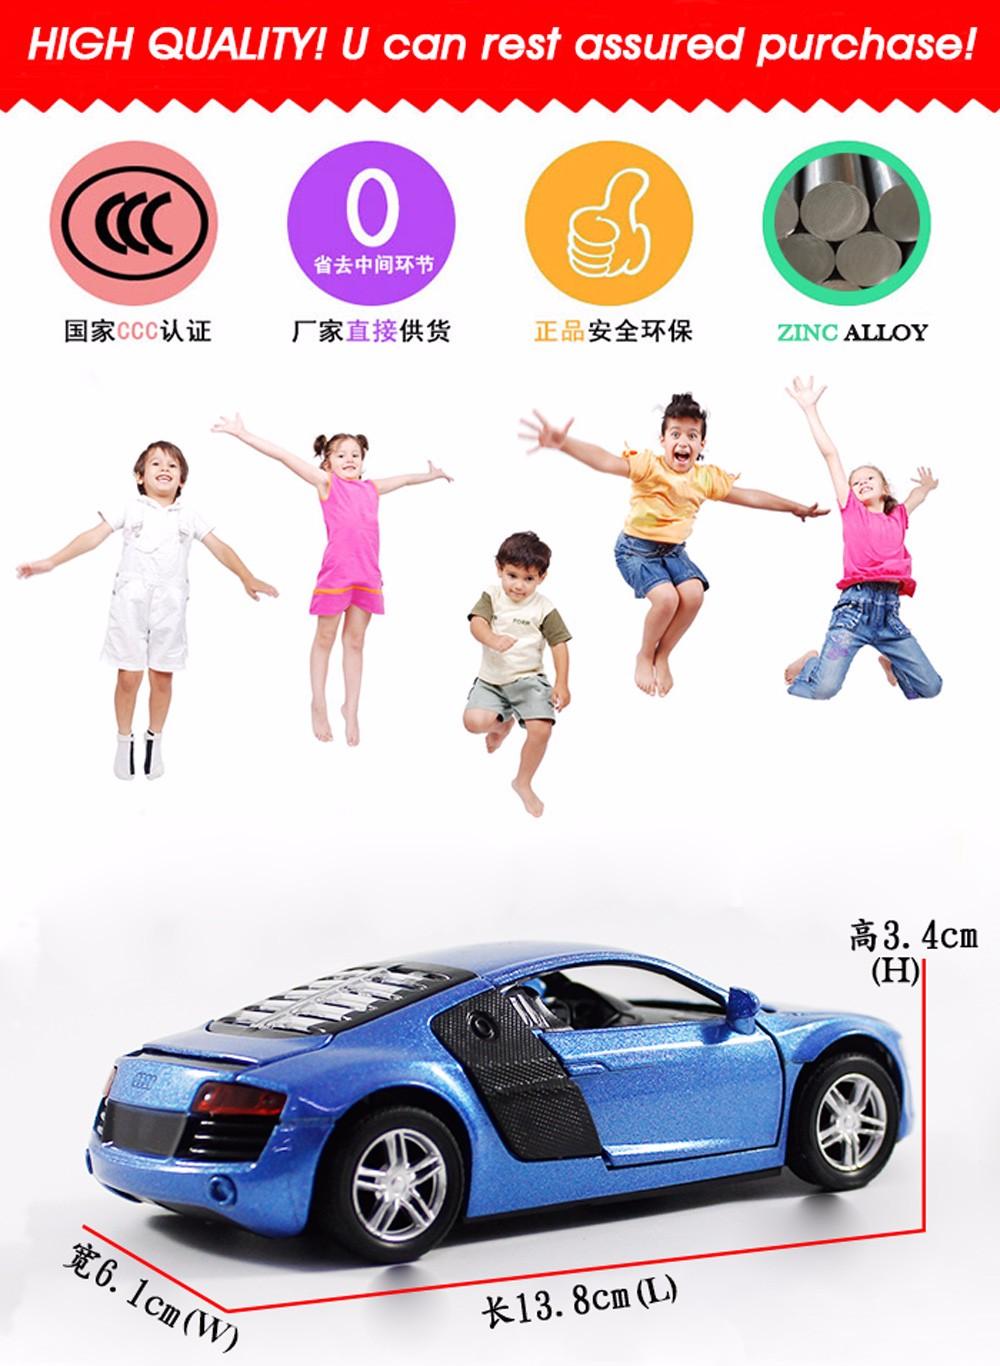 Audi-R8-Diecast-car-7